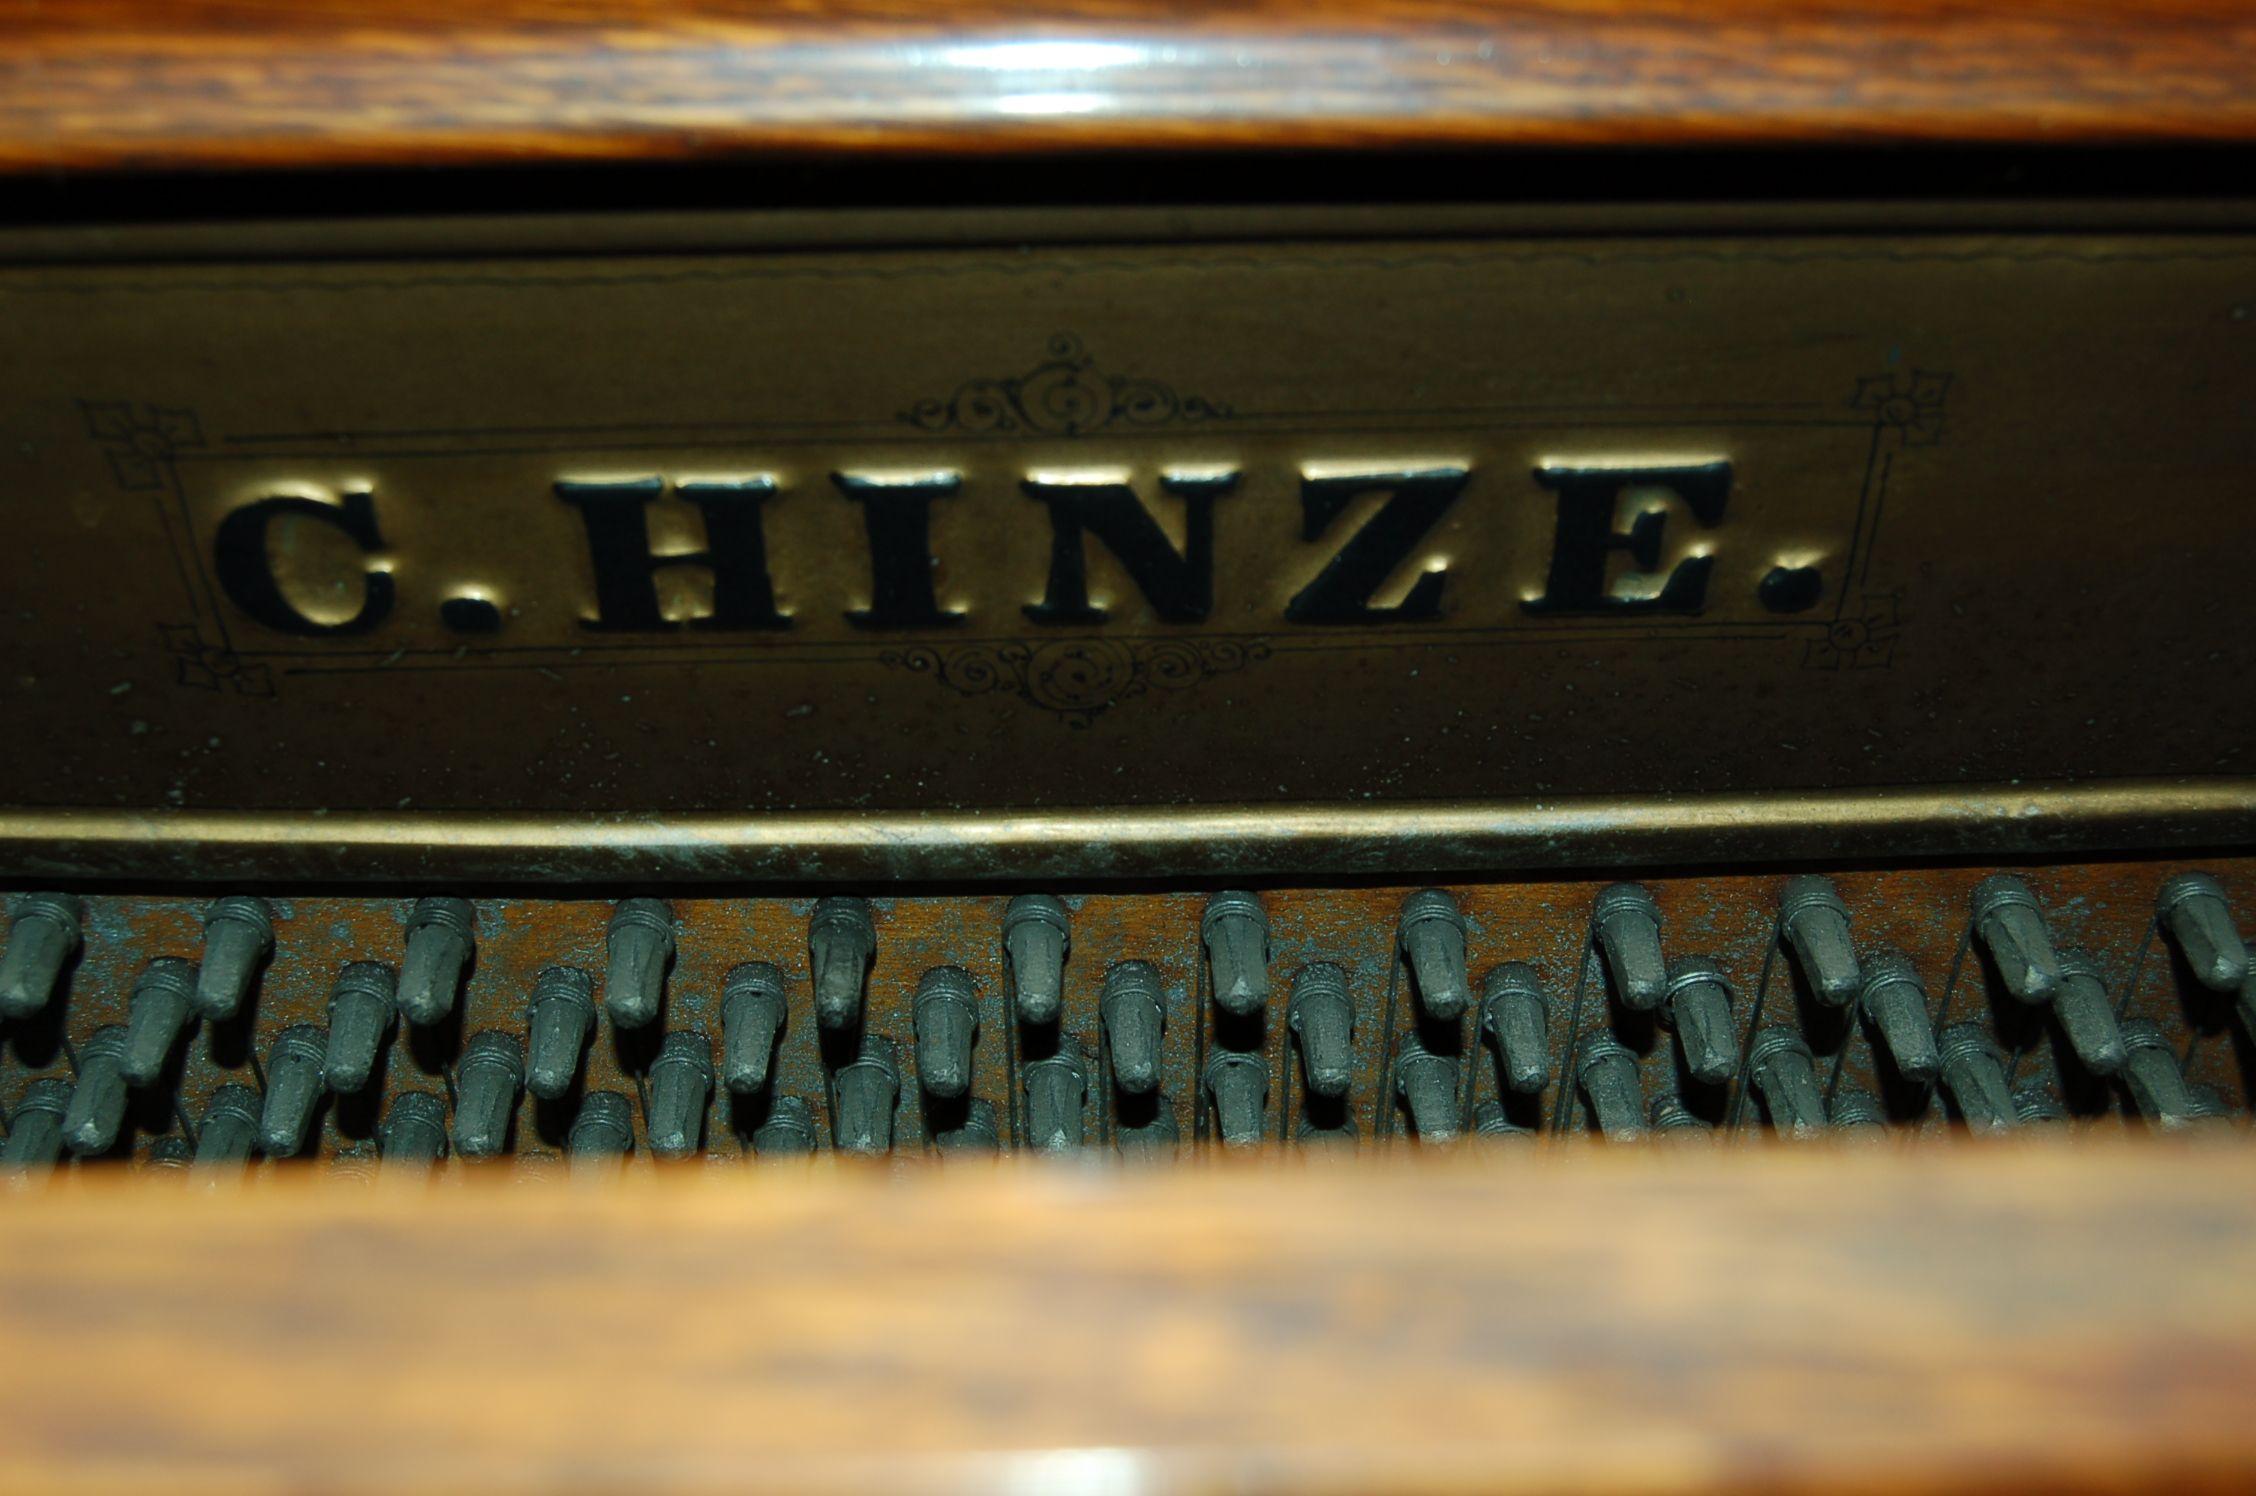 C Hinze Mark On Upright Oak Pianos Soundboard Circa 1900 1915